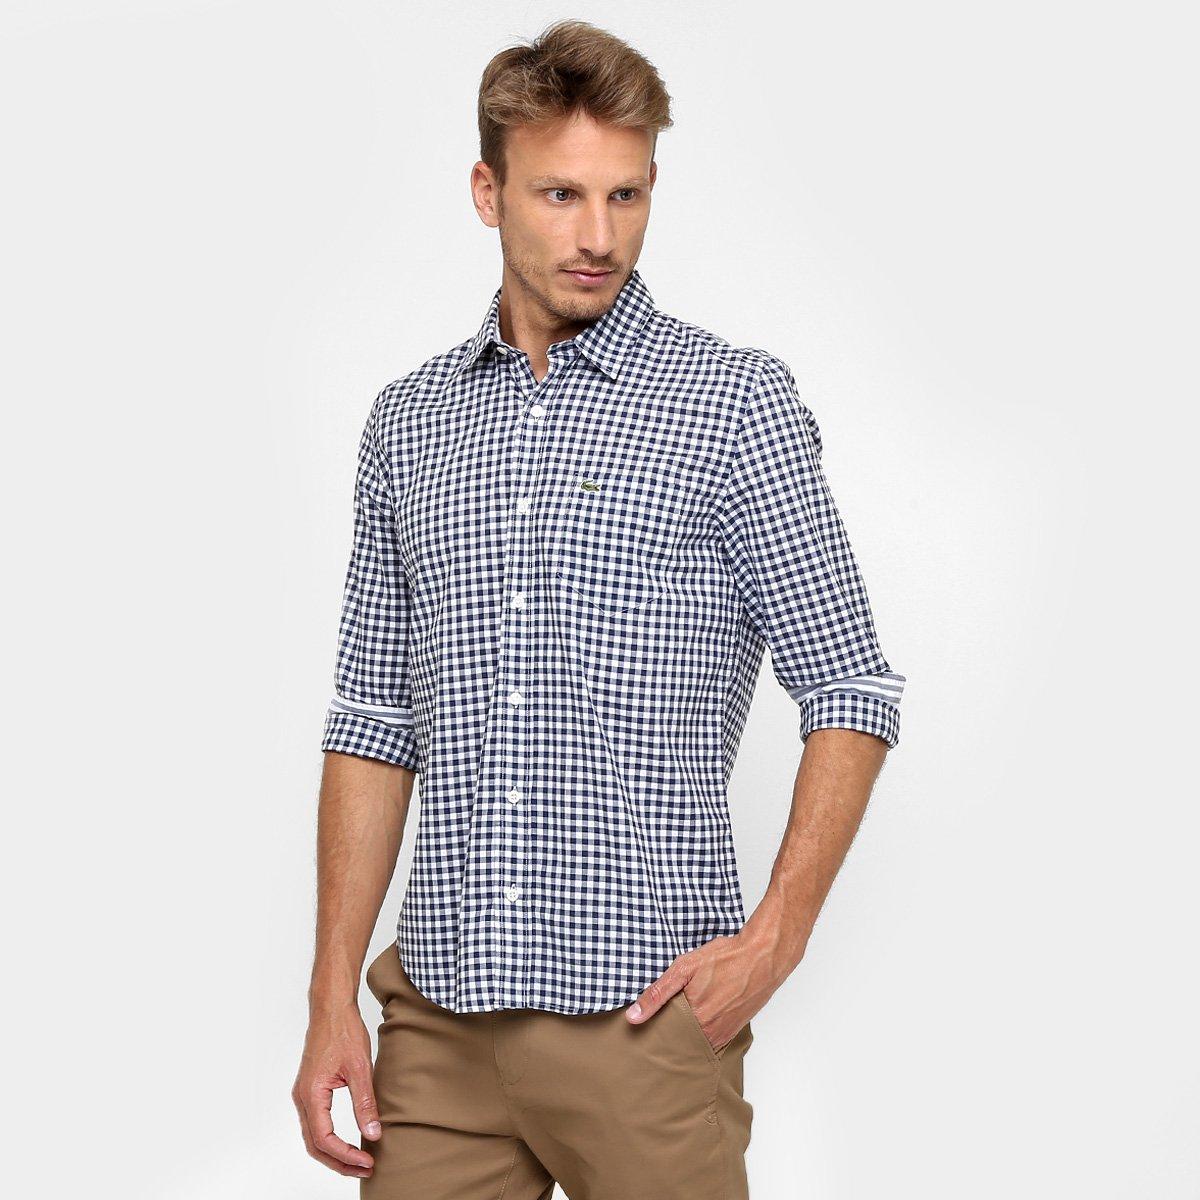 Camisa Lacoste Xadrez Regular Fit Manga Longa - Compre Agora  191ceebb560